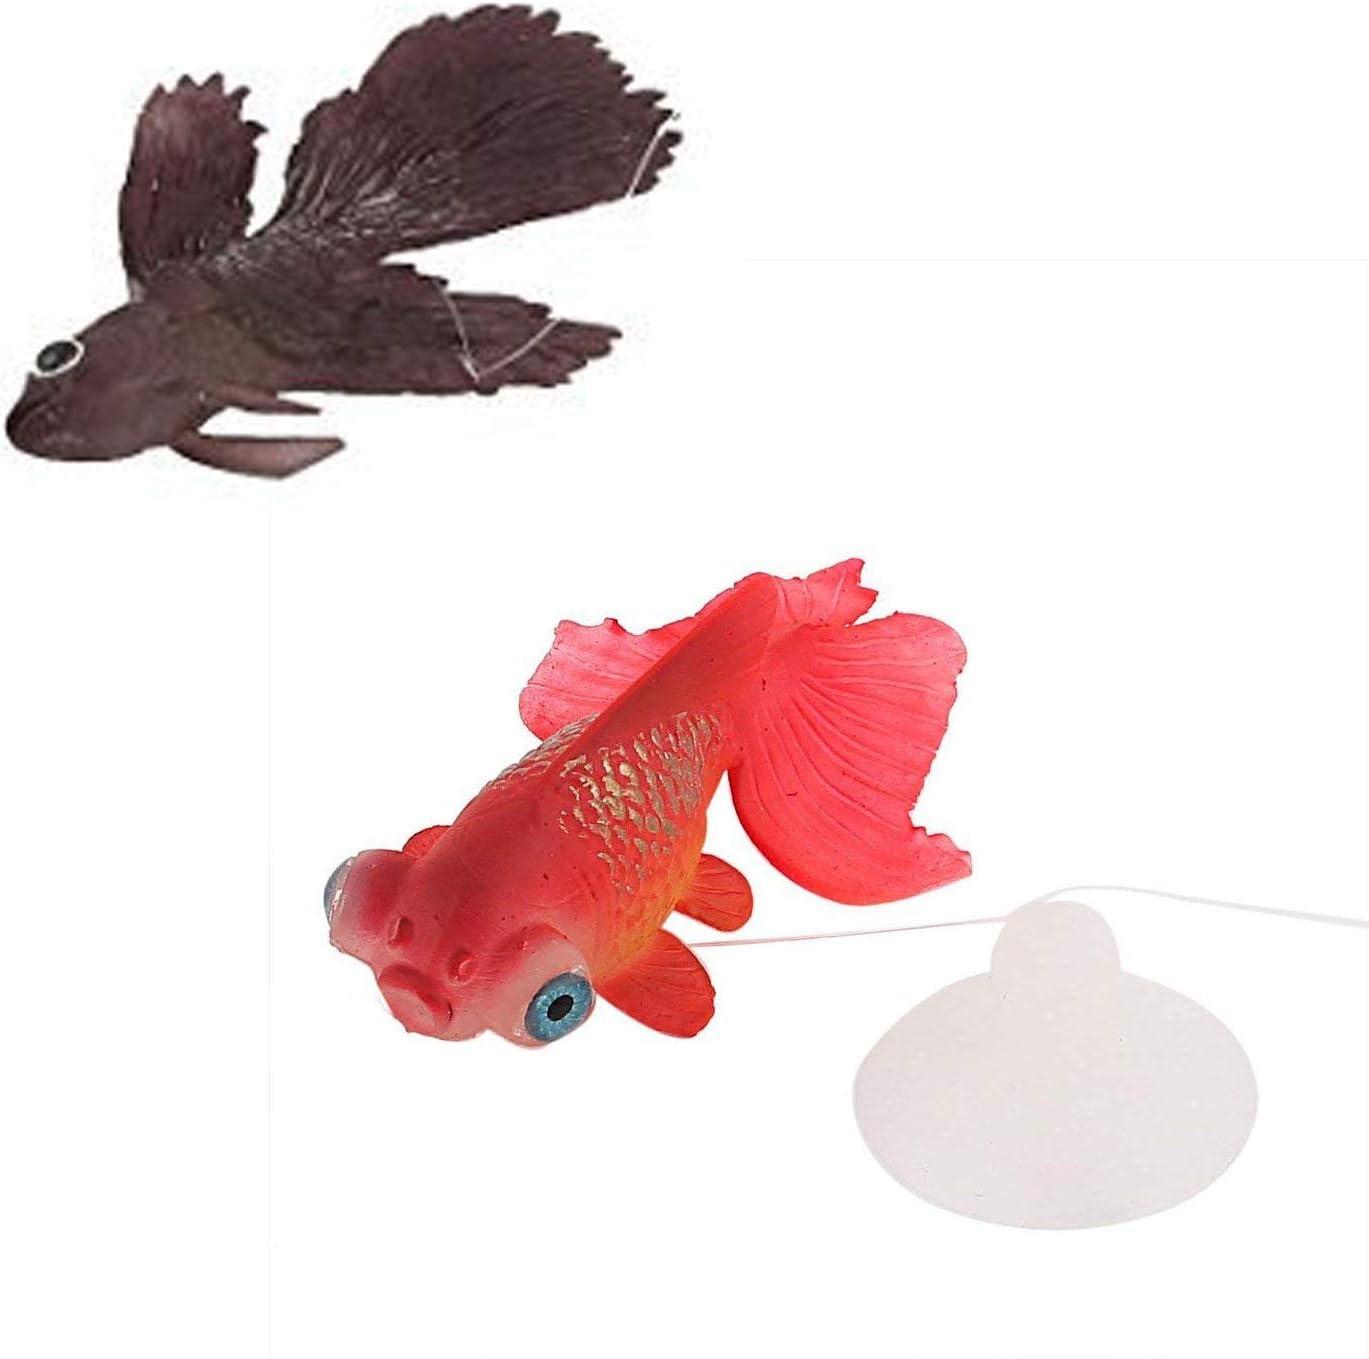 LDEXIN 2pcs Silicone Artificial Aquarium Floating Goldfish Decoration Fish Tank Suction Cup Decor Underwater Saltwater Swimming Fish Ornament